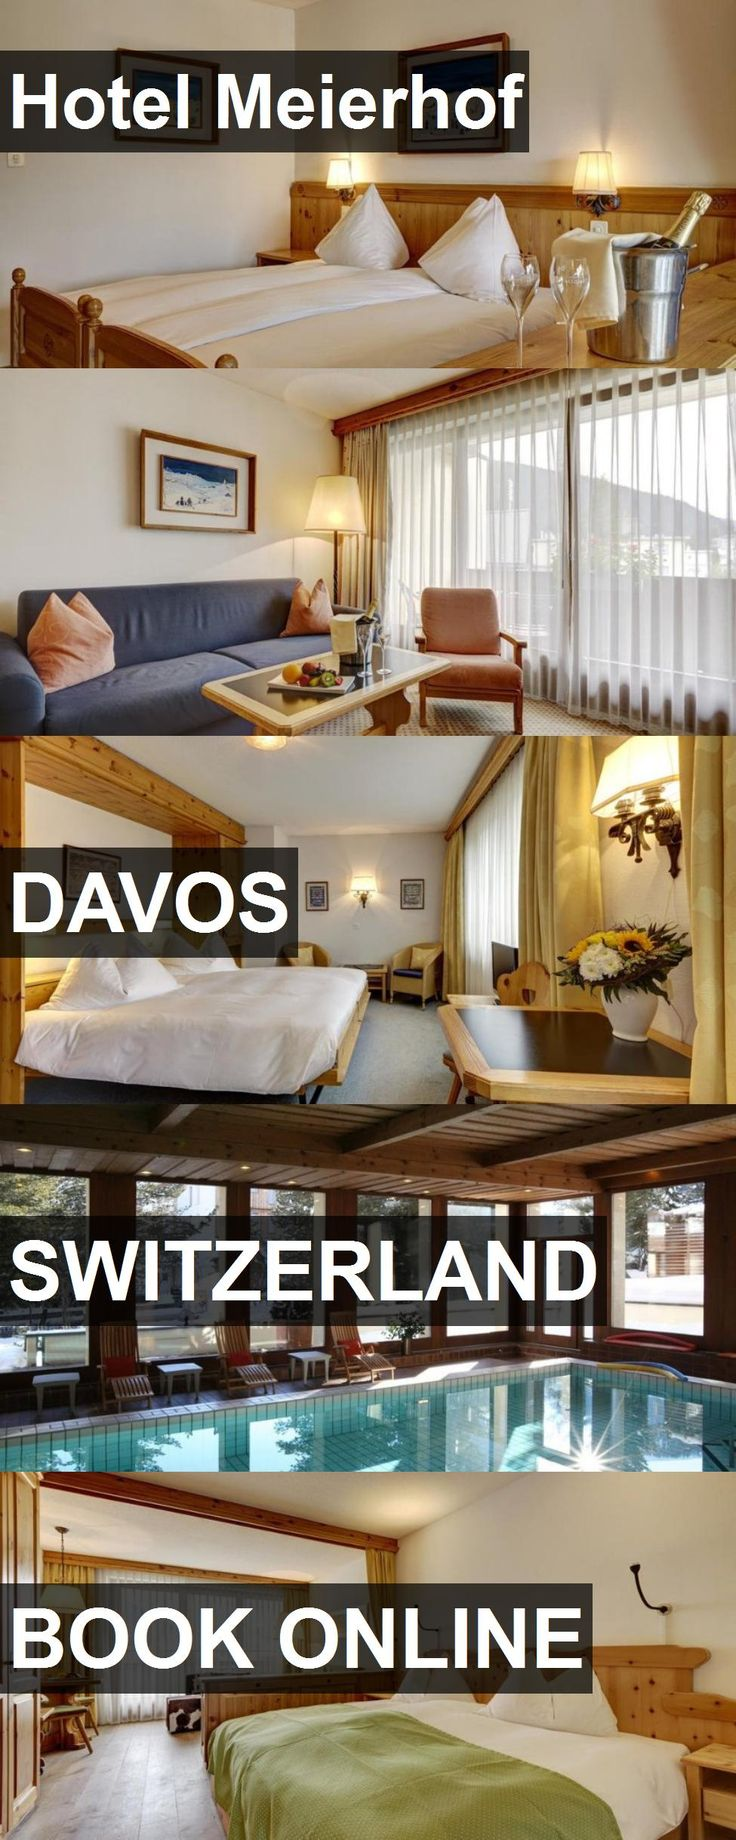 Hotel Hotel Meierhof in Davos, Switzerland. For more information, photos, reviews and best prices please follow the link. #Switzerland #Davos #HotelMeierhof #hotel #travel #vacation